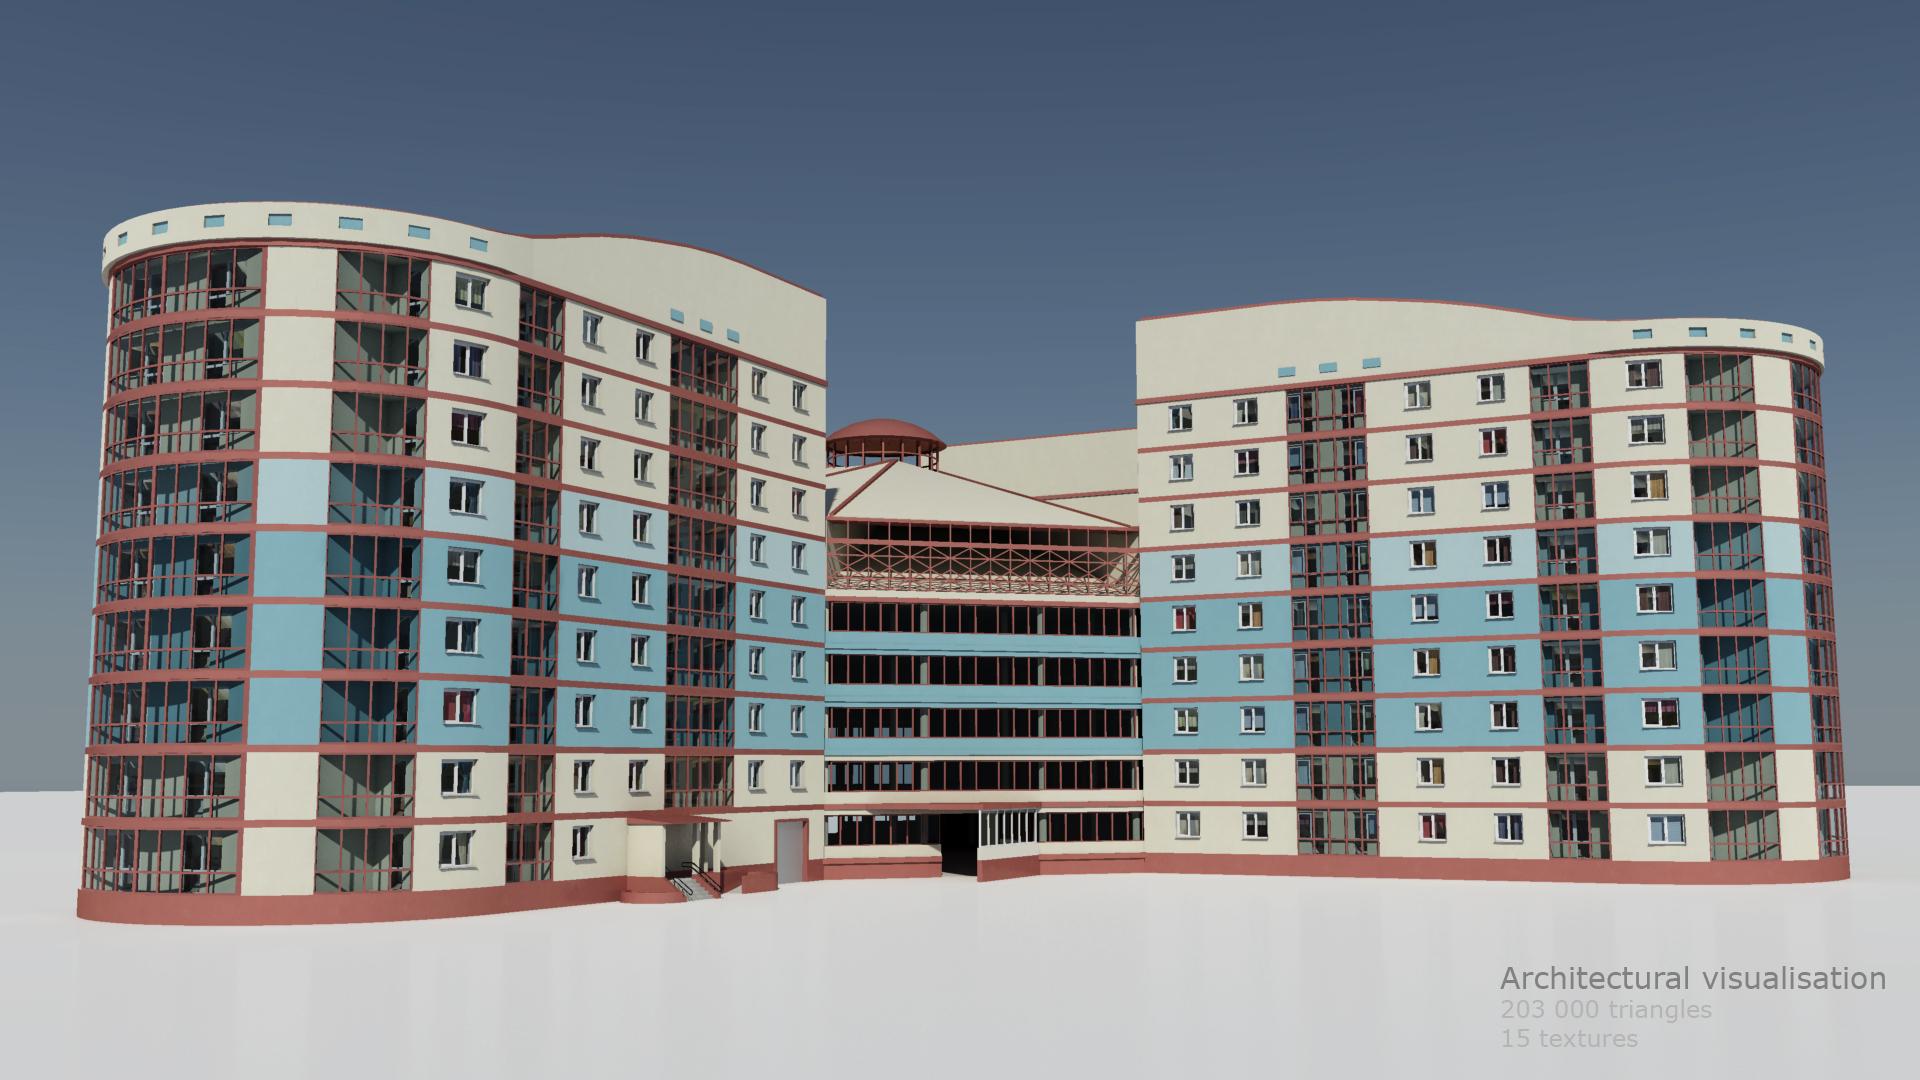 arch_visualisation